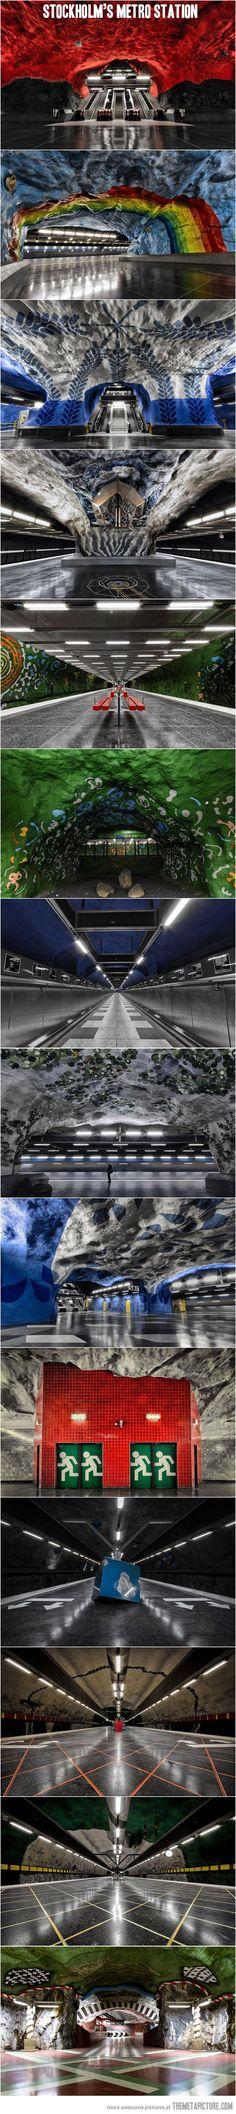 Stunning underground art…